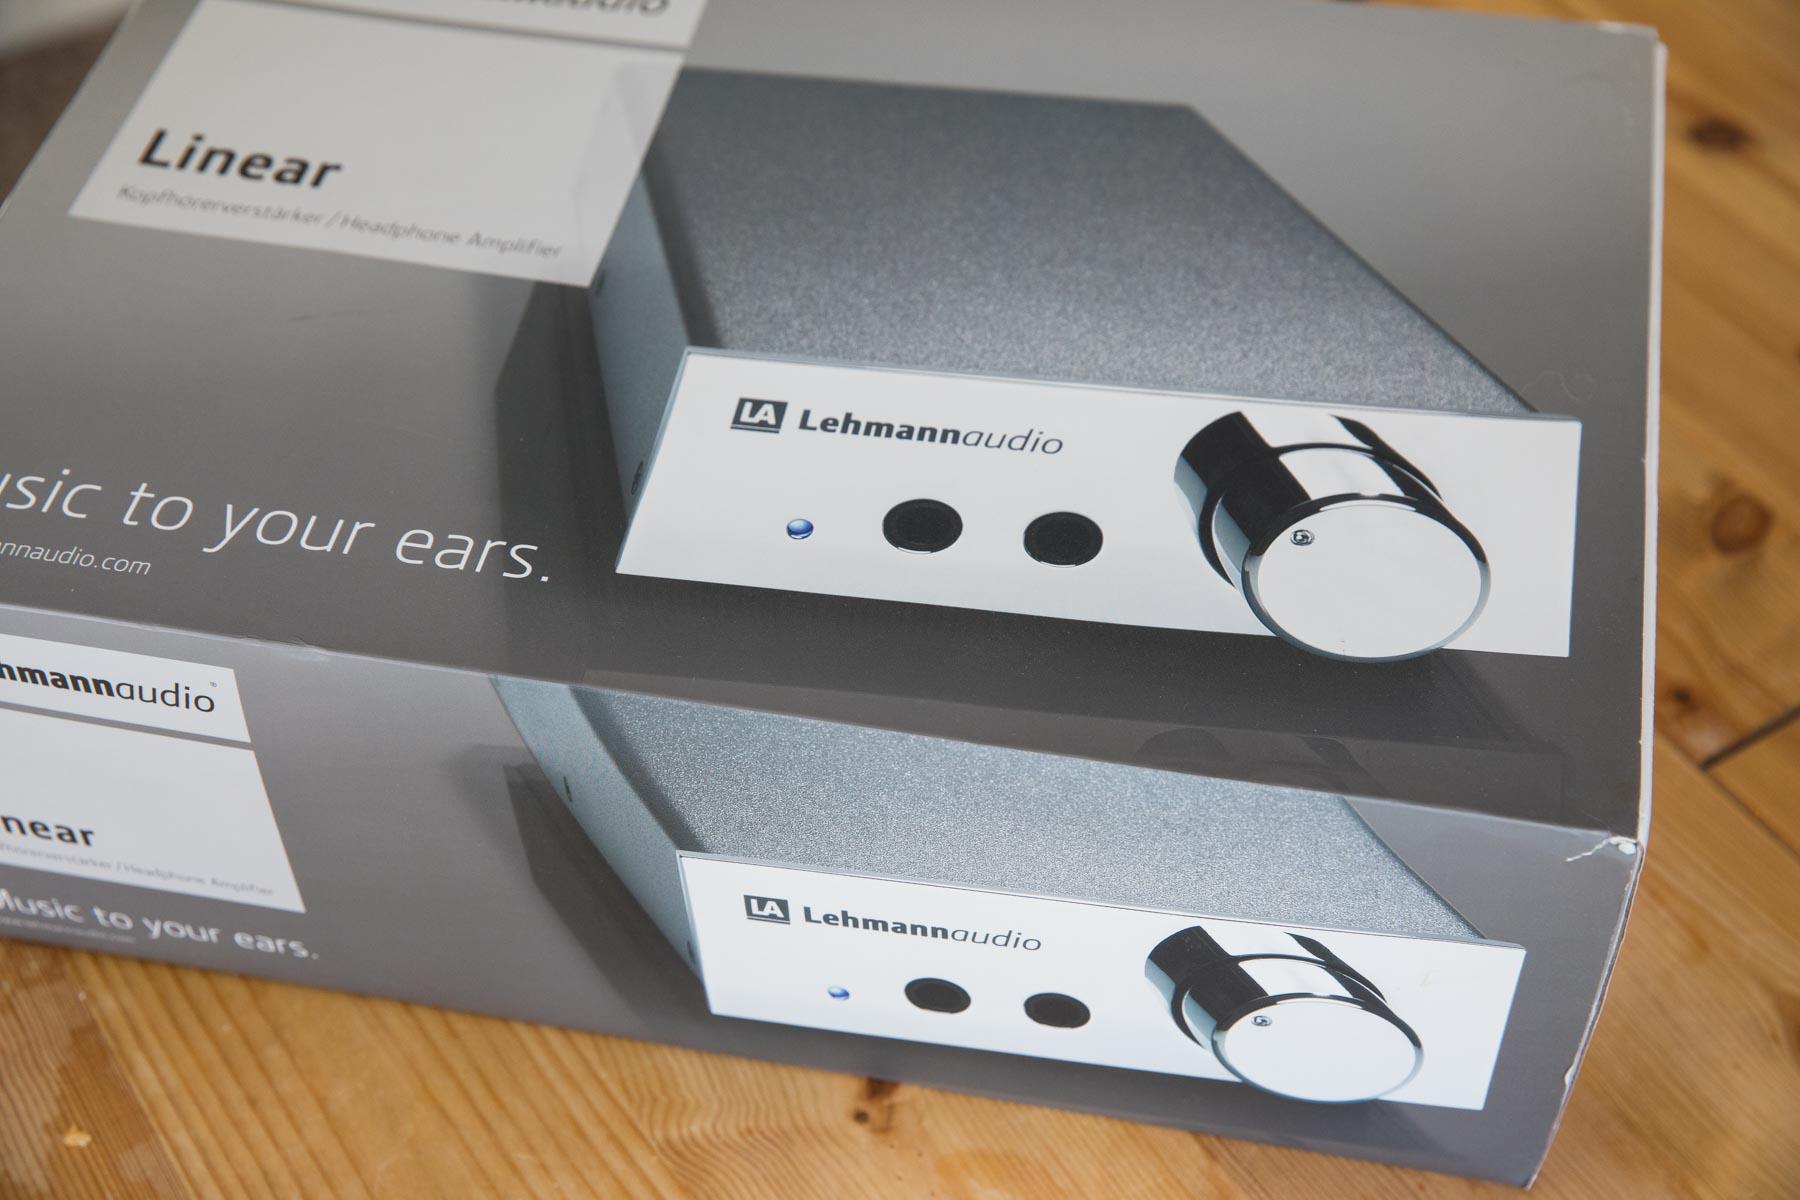 SOLD Lehmann Linear Headphone Amplifier | Headphone Reviews and